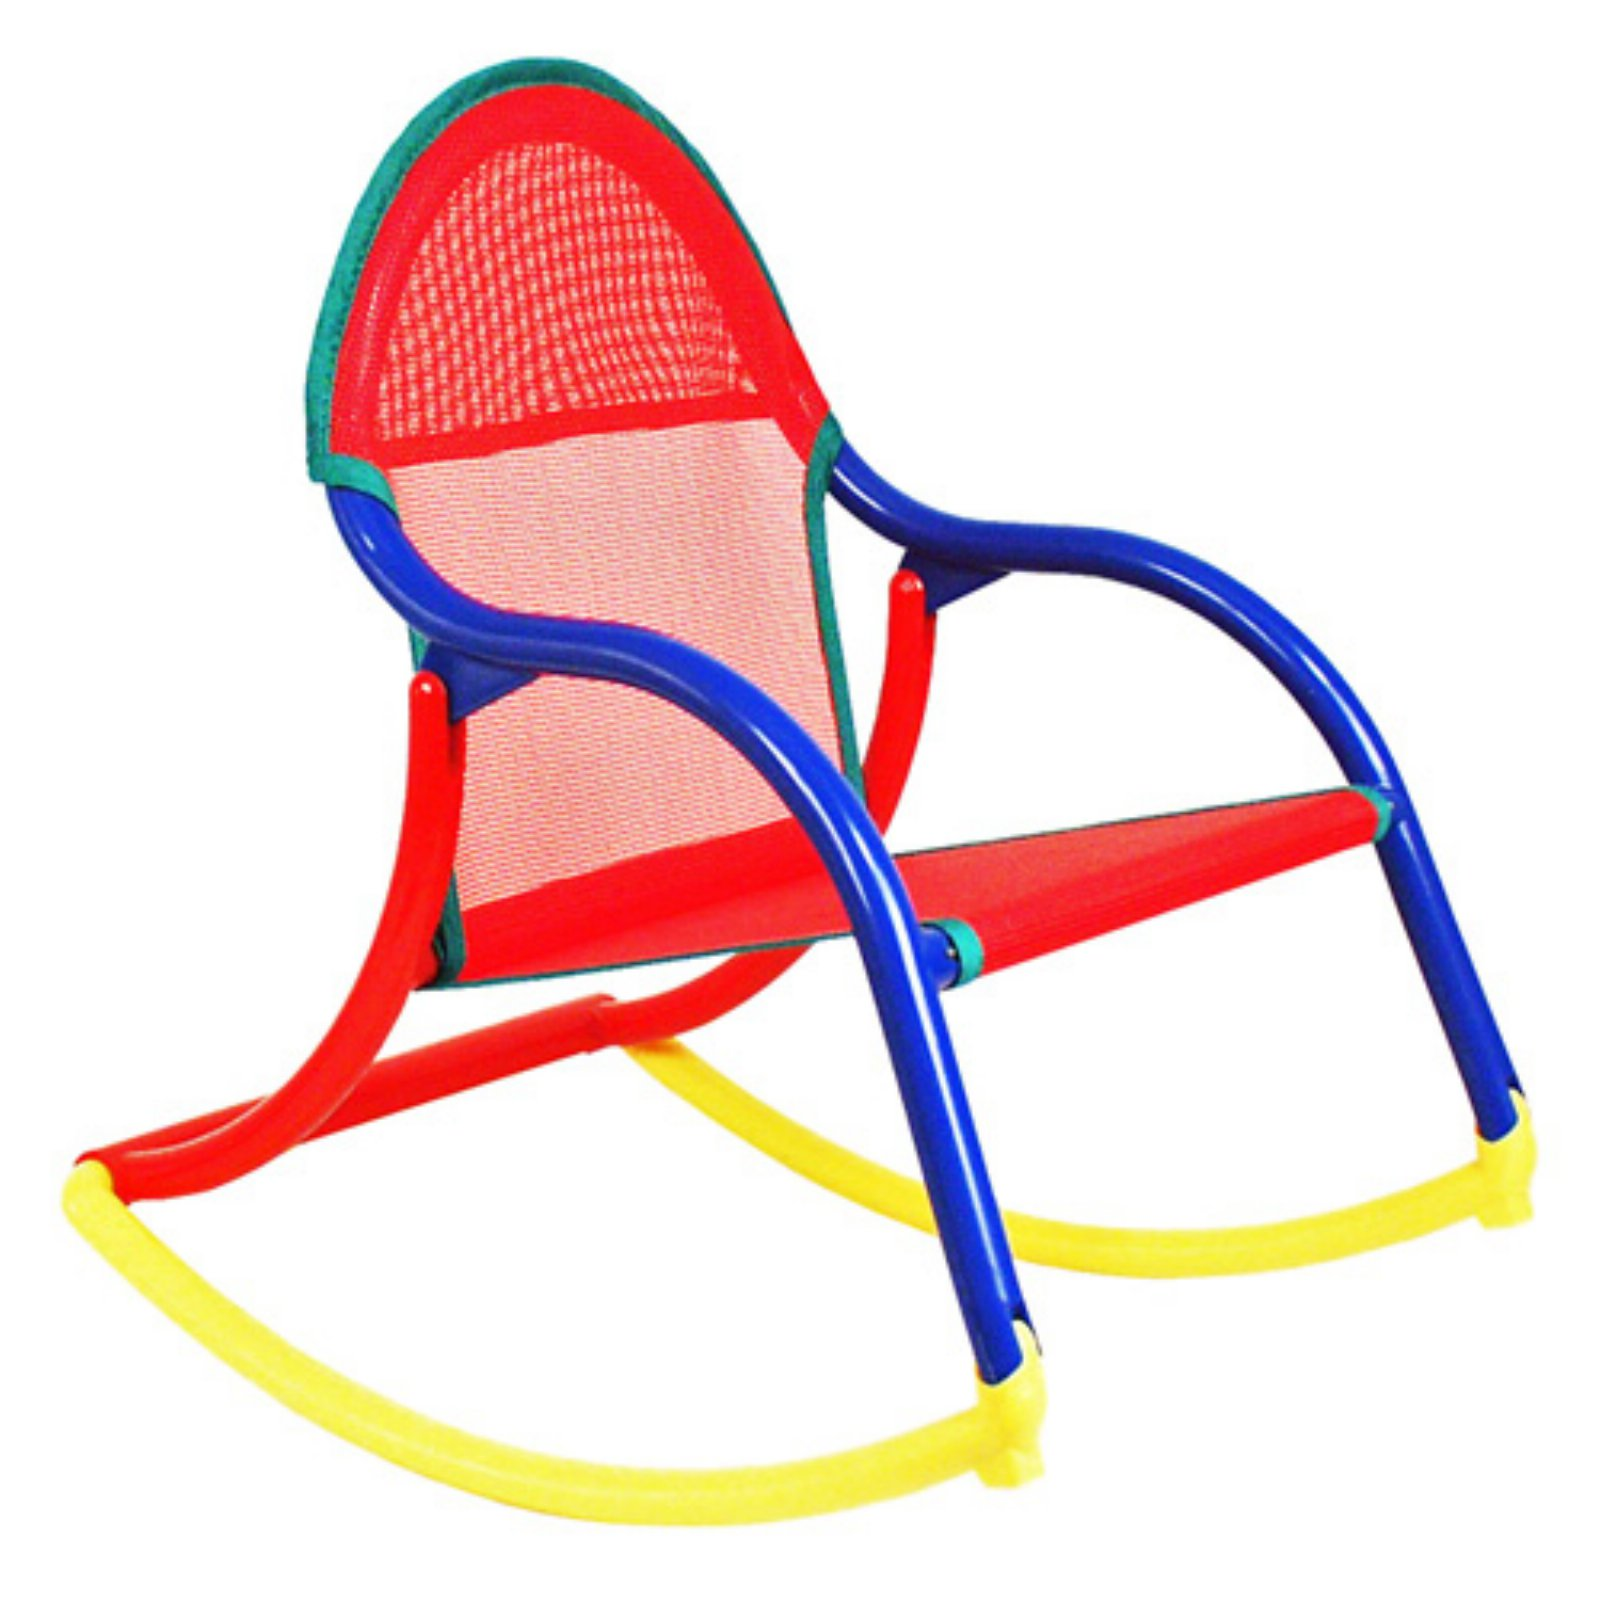 Hoohobbers Mesh Rocking Chair